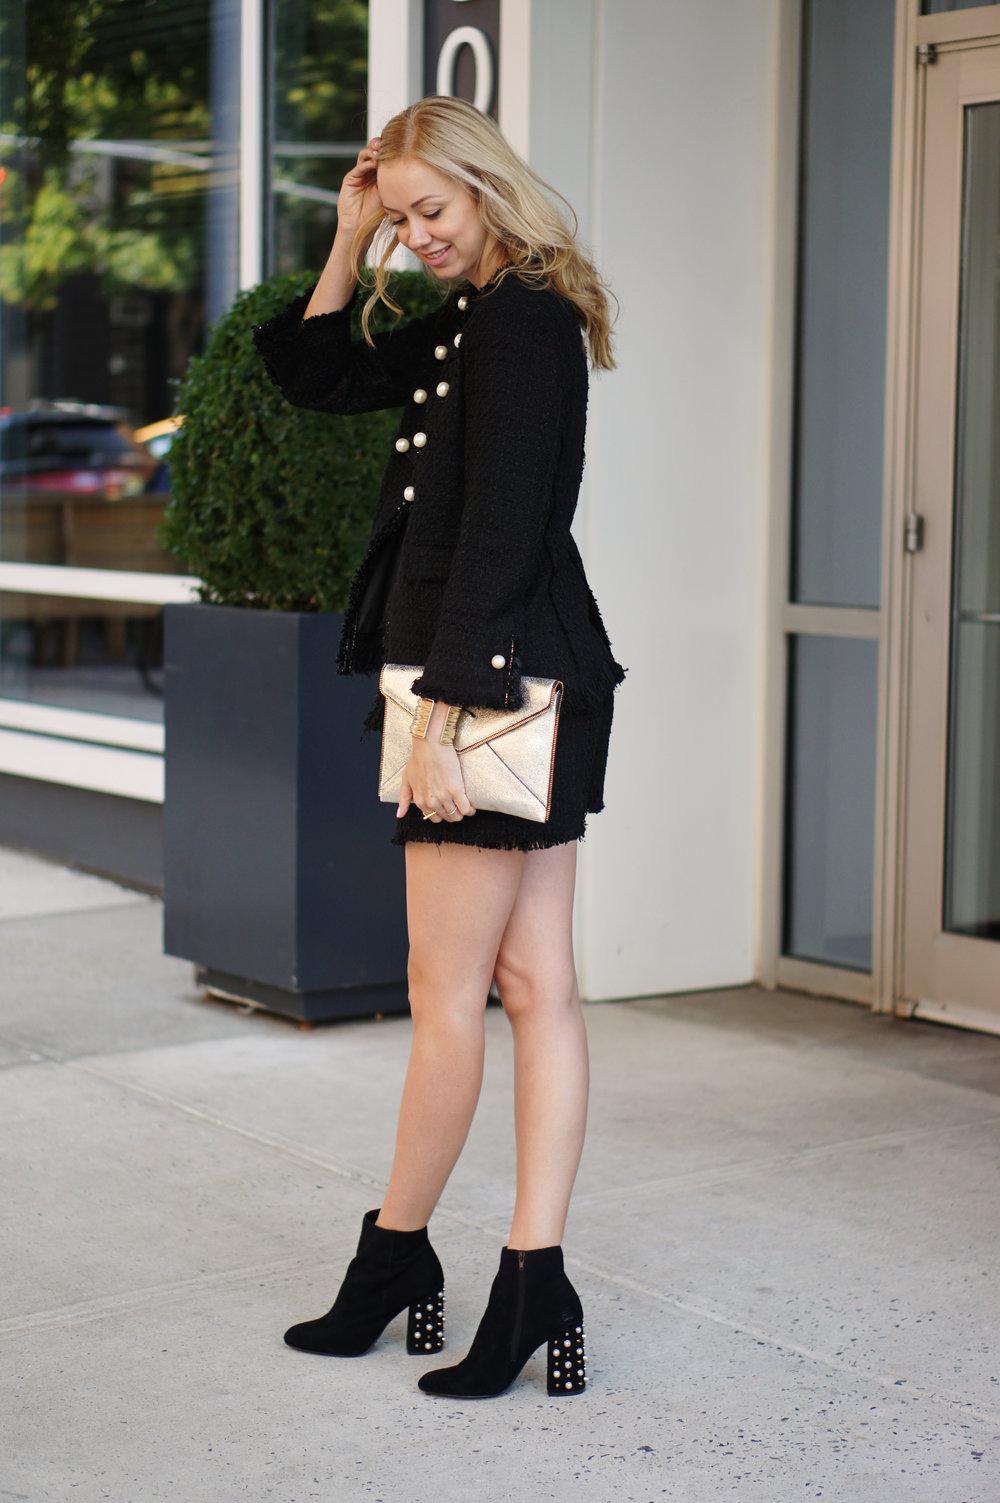 rebecca-minkoff-leo-clutch-gold-champagne-steve-madden-black-boots-pearl.jpg